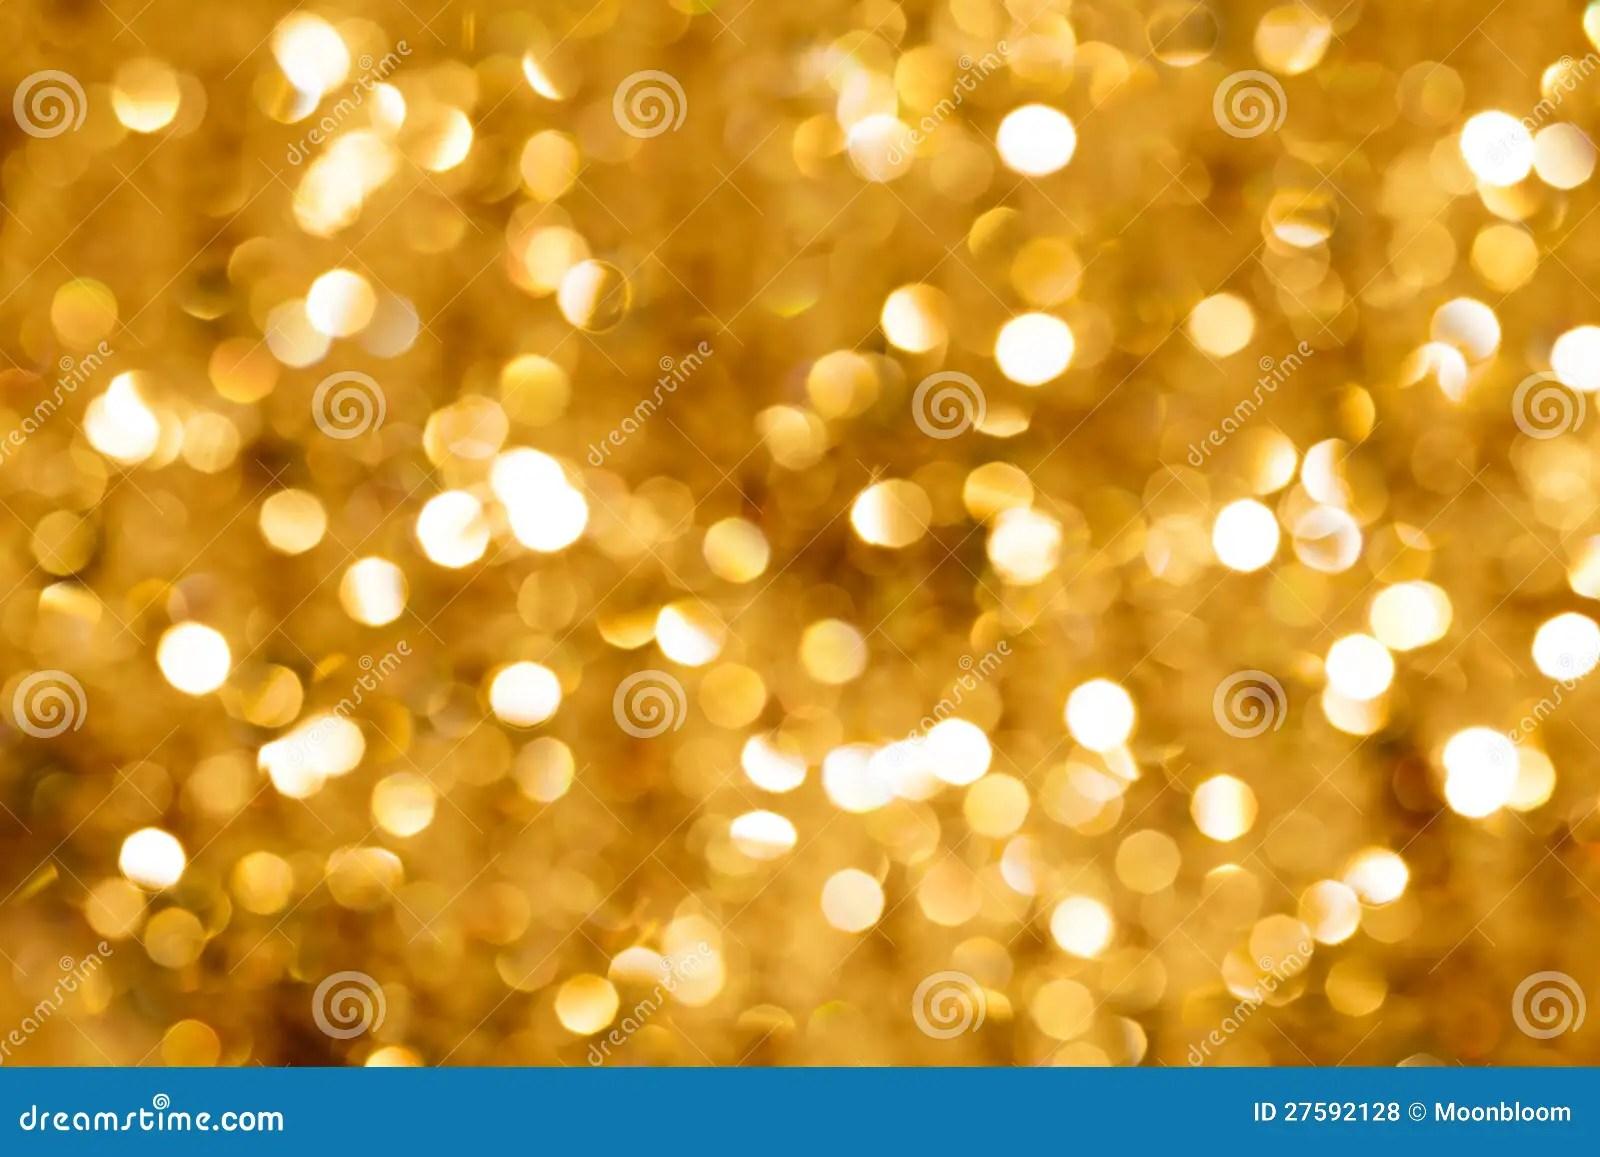 Girls Corn Wallpaper Gold Bokeh Light Royalty Free Stock Photos Image 27592128